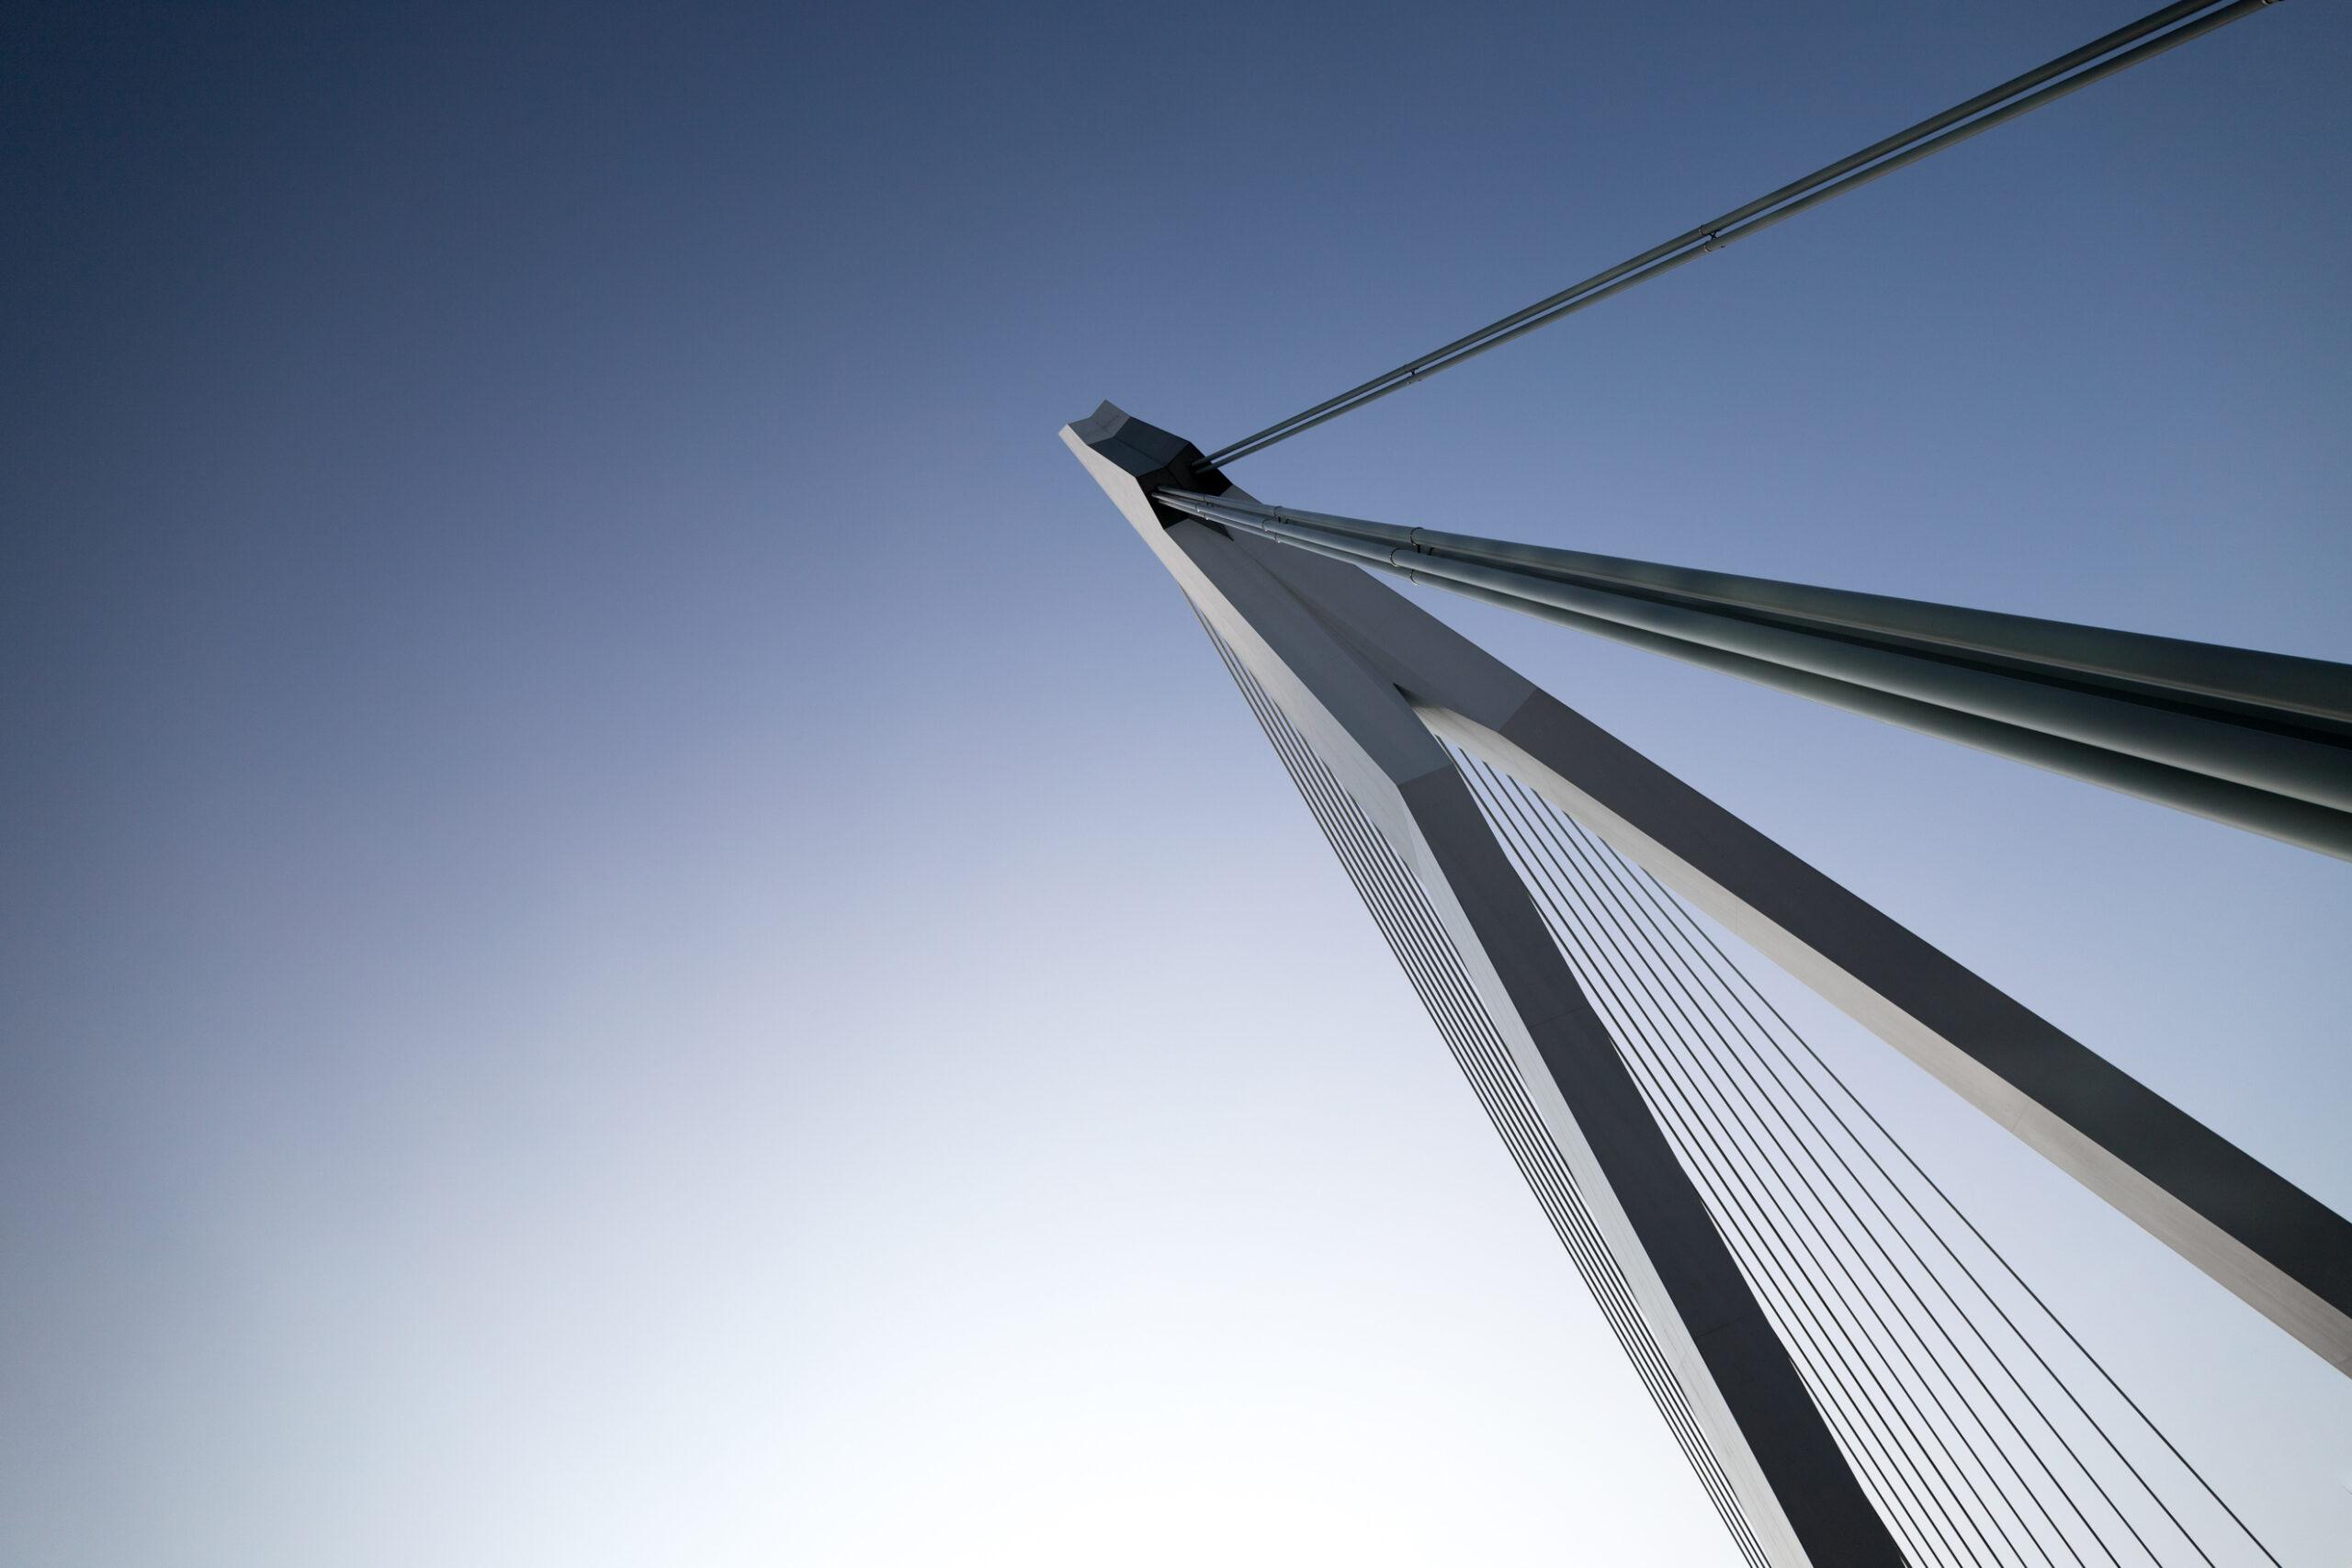 Erasmusbrug, Rotterdam, Netherlands, 2019